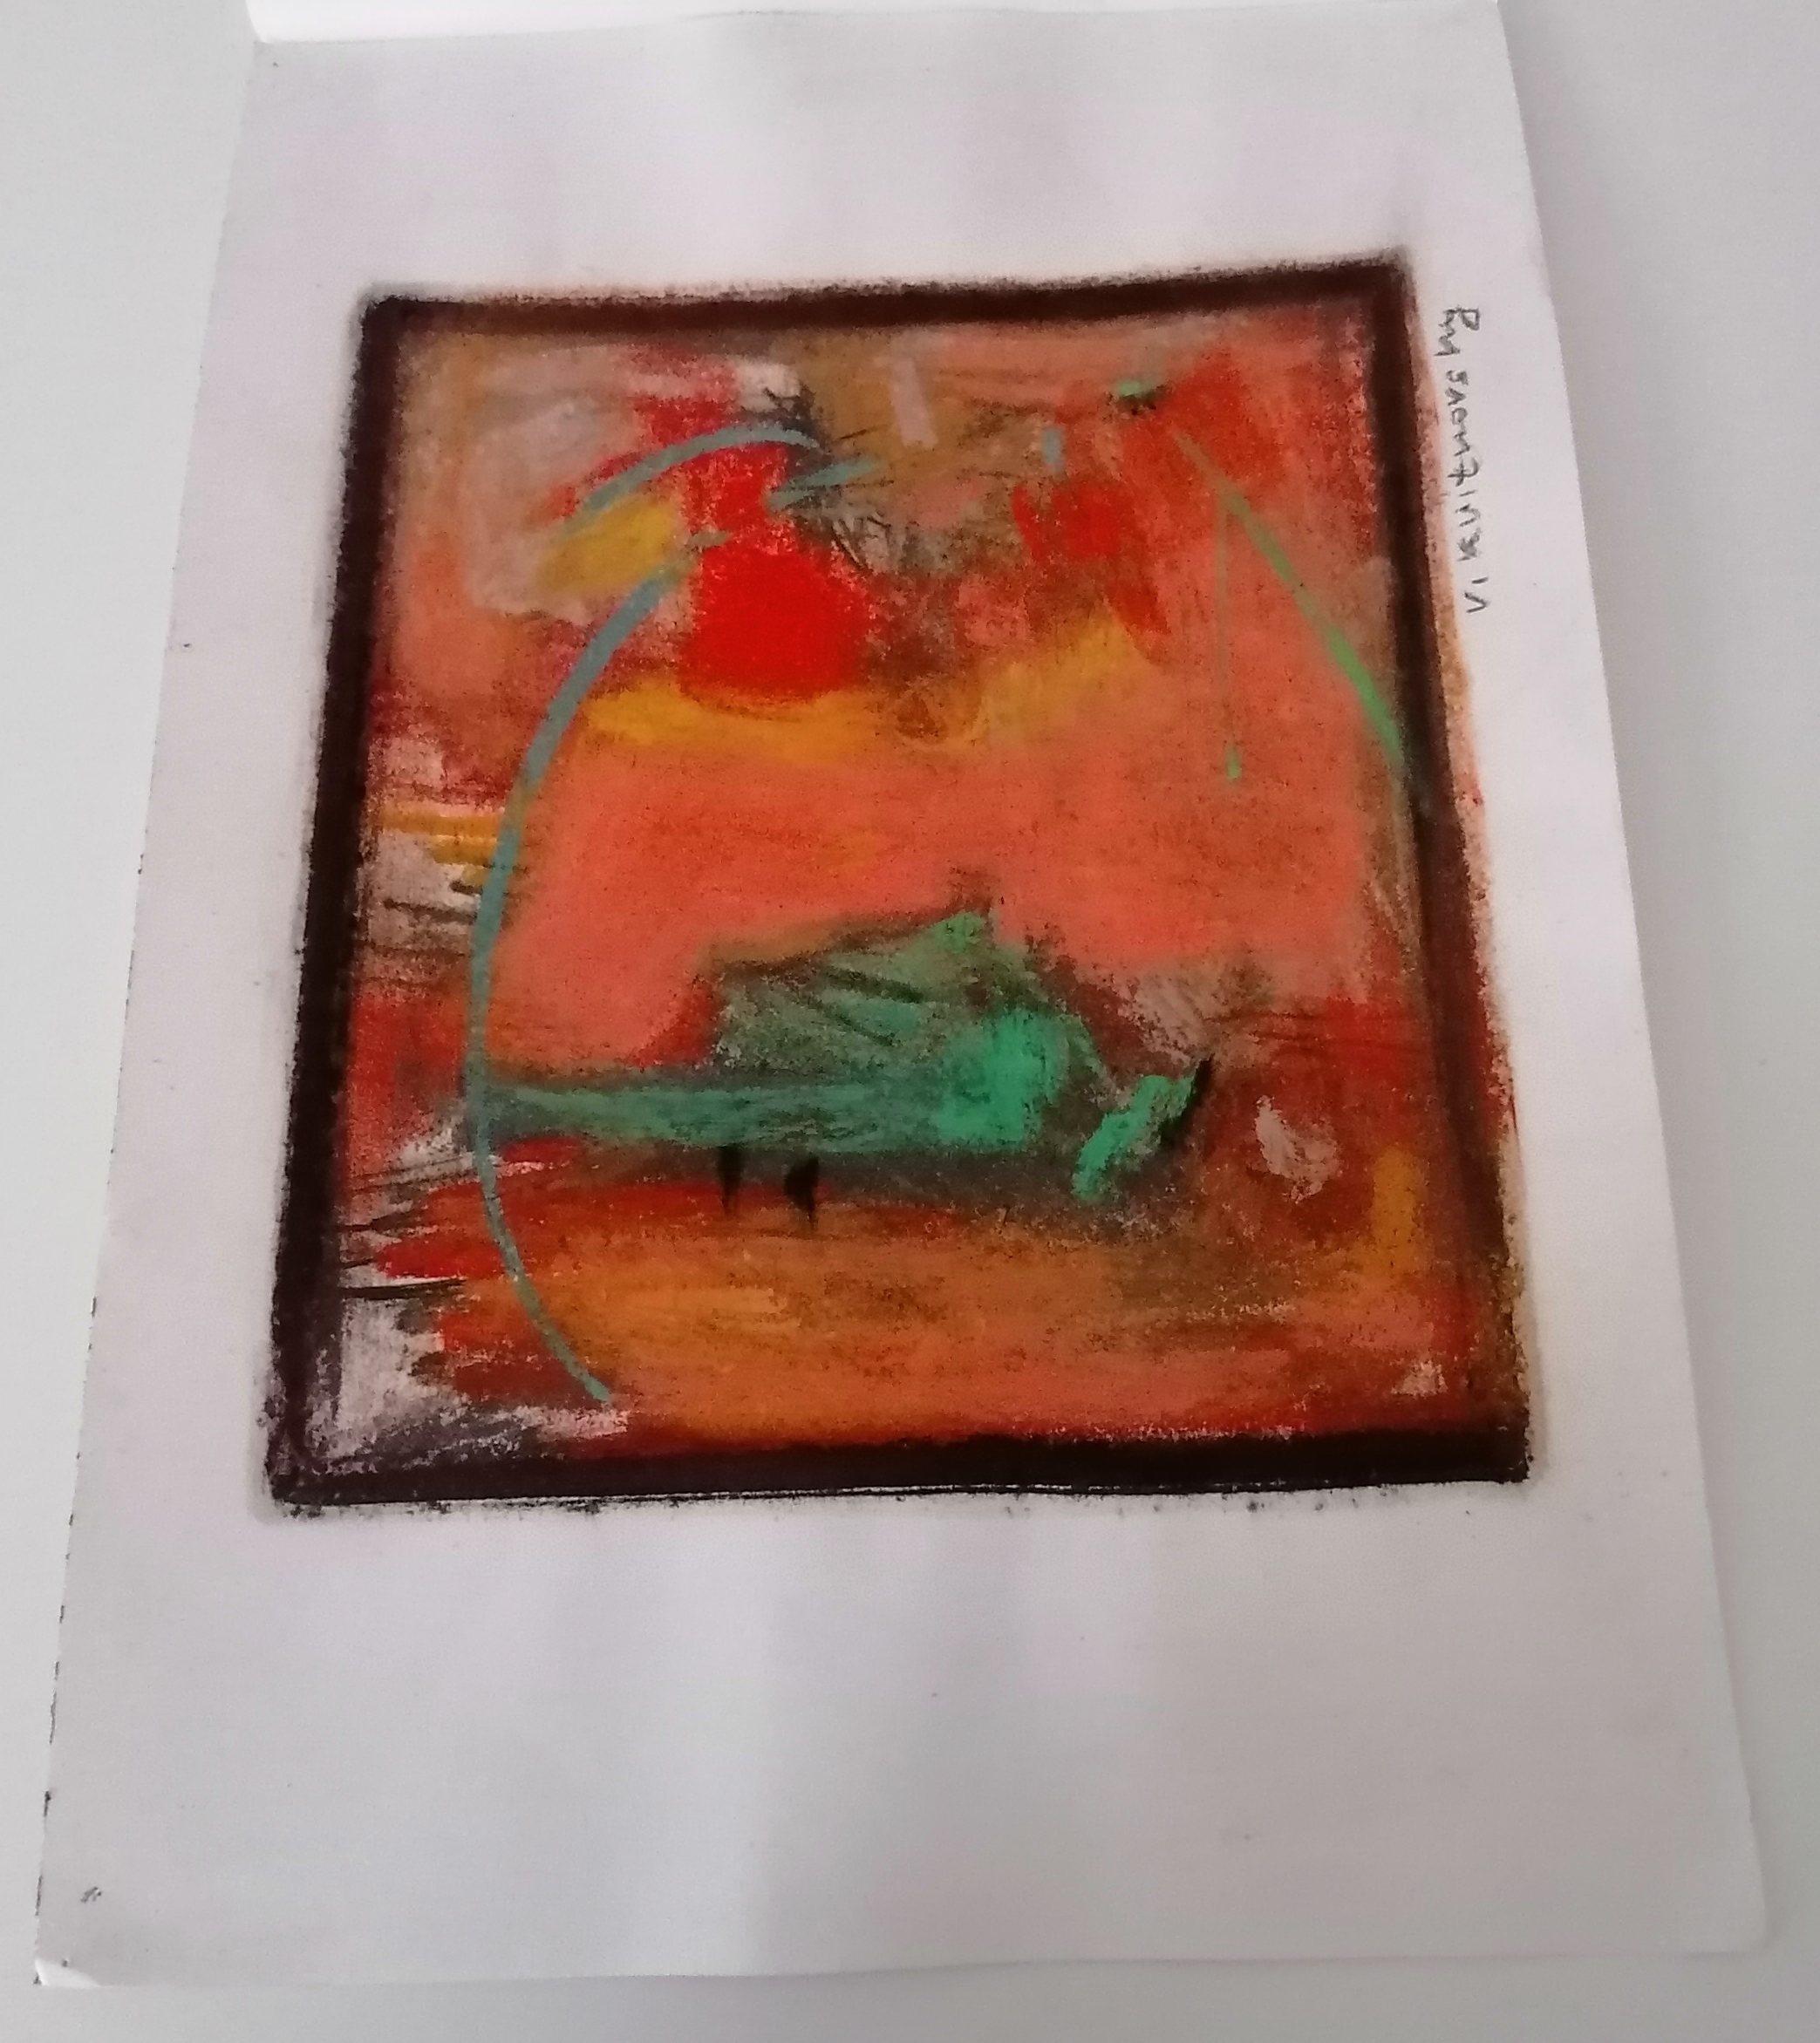 https://www.norstamps.com/content/images/stamps/gtgallerier/160.jpg